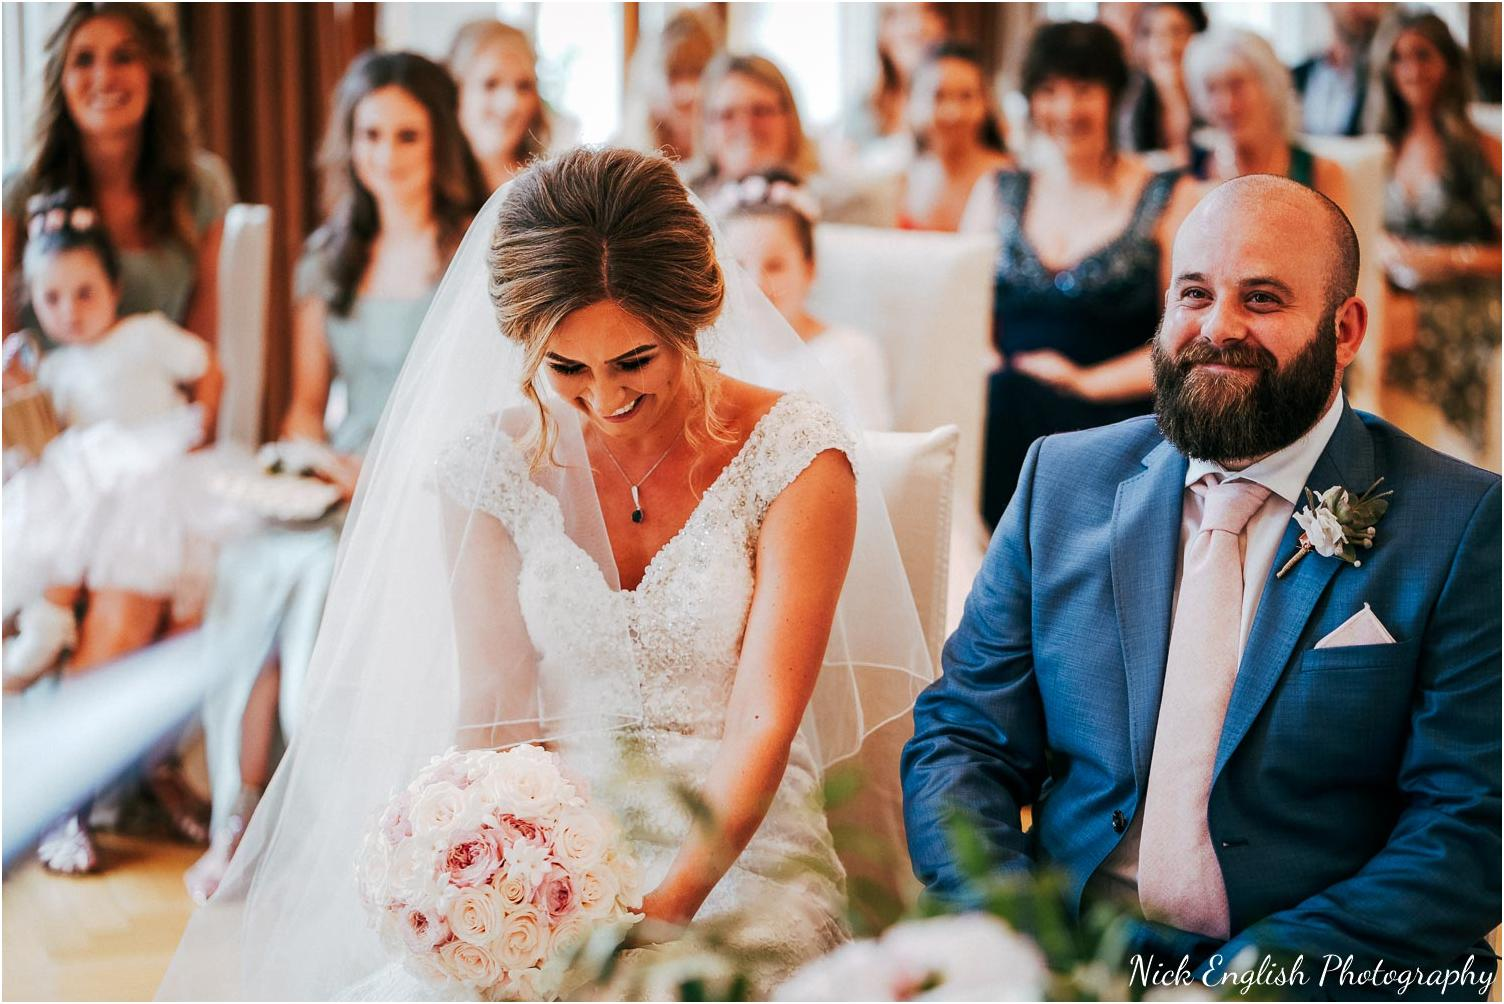 Destination_Wedding_Photographer_Slovenia_Nick_English_Photography-40.jpg